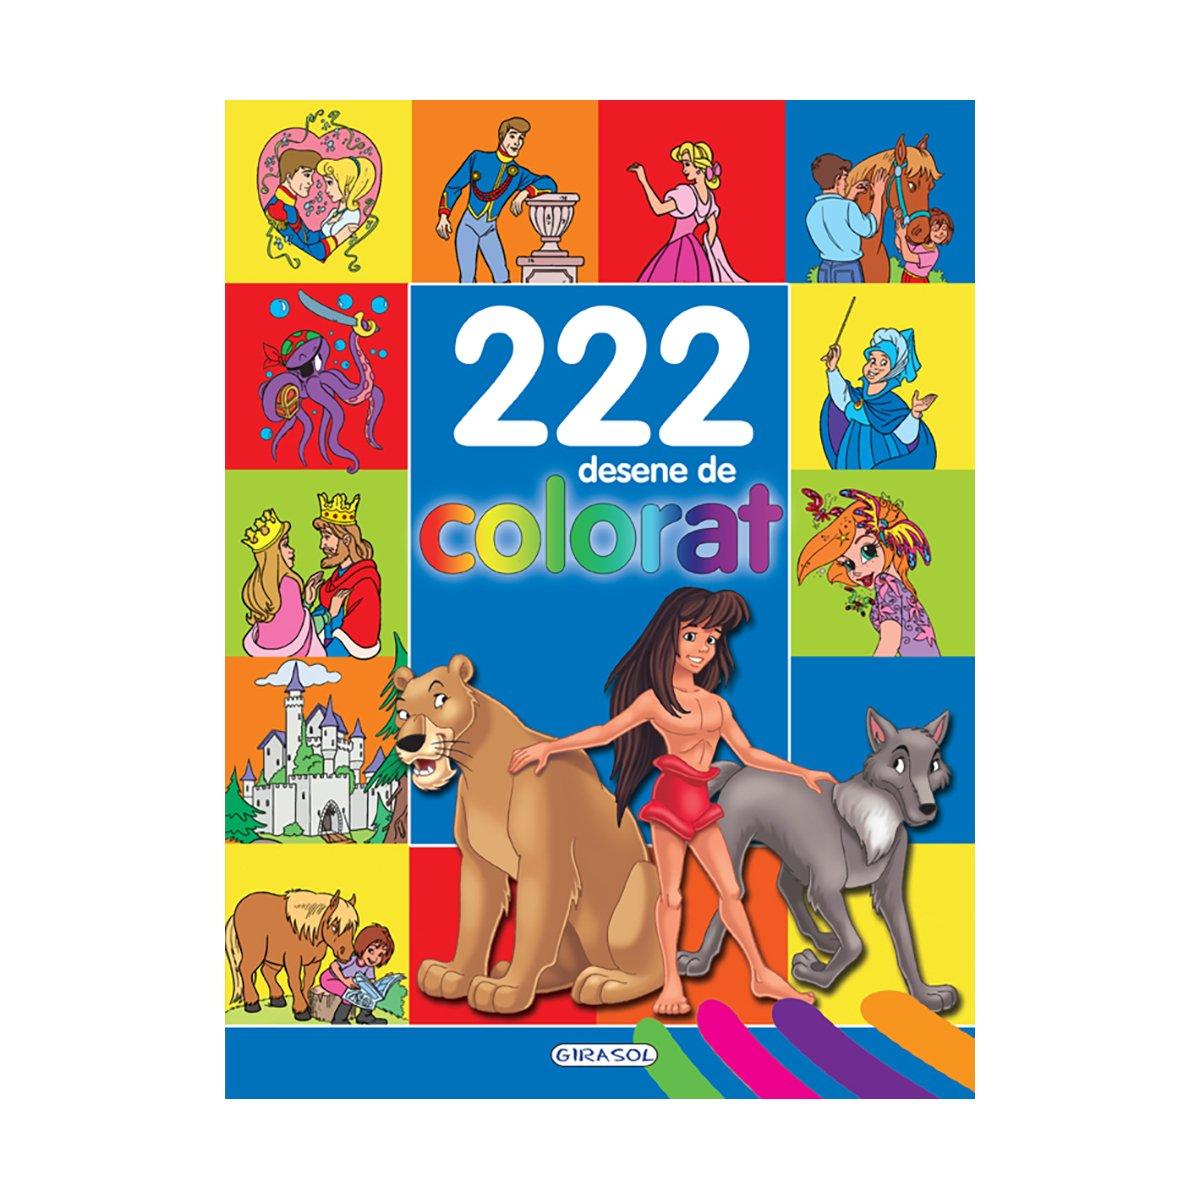 Carte Editura Girasol, 222 desene de colorat